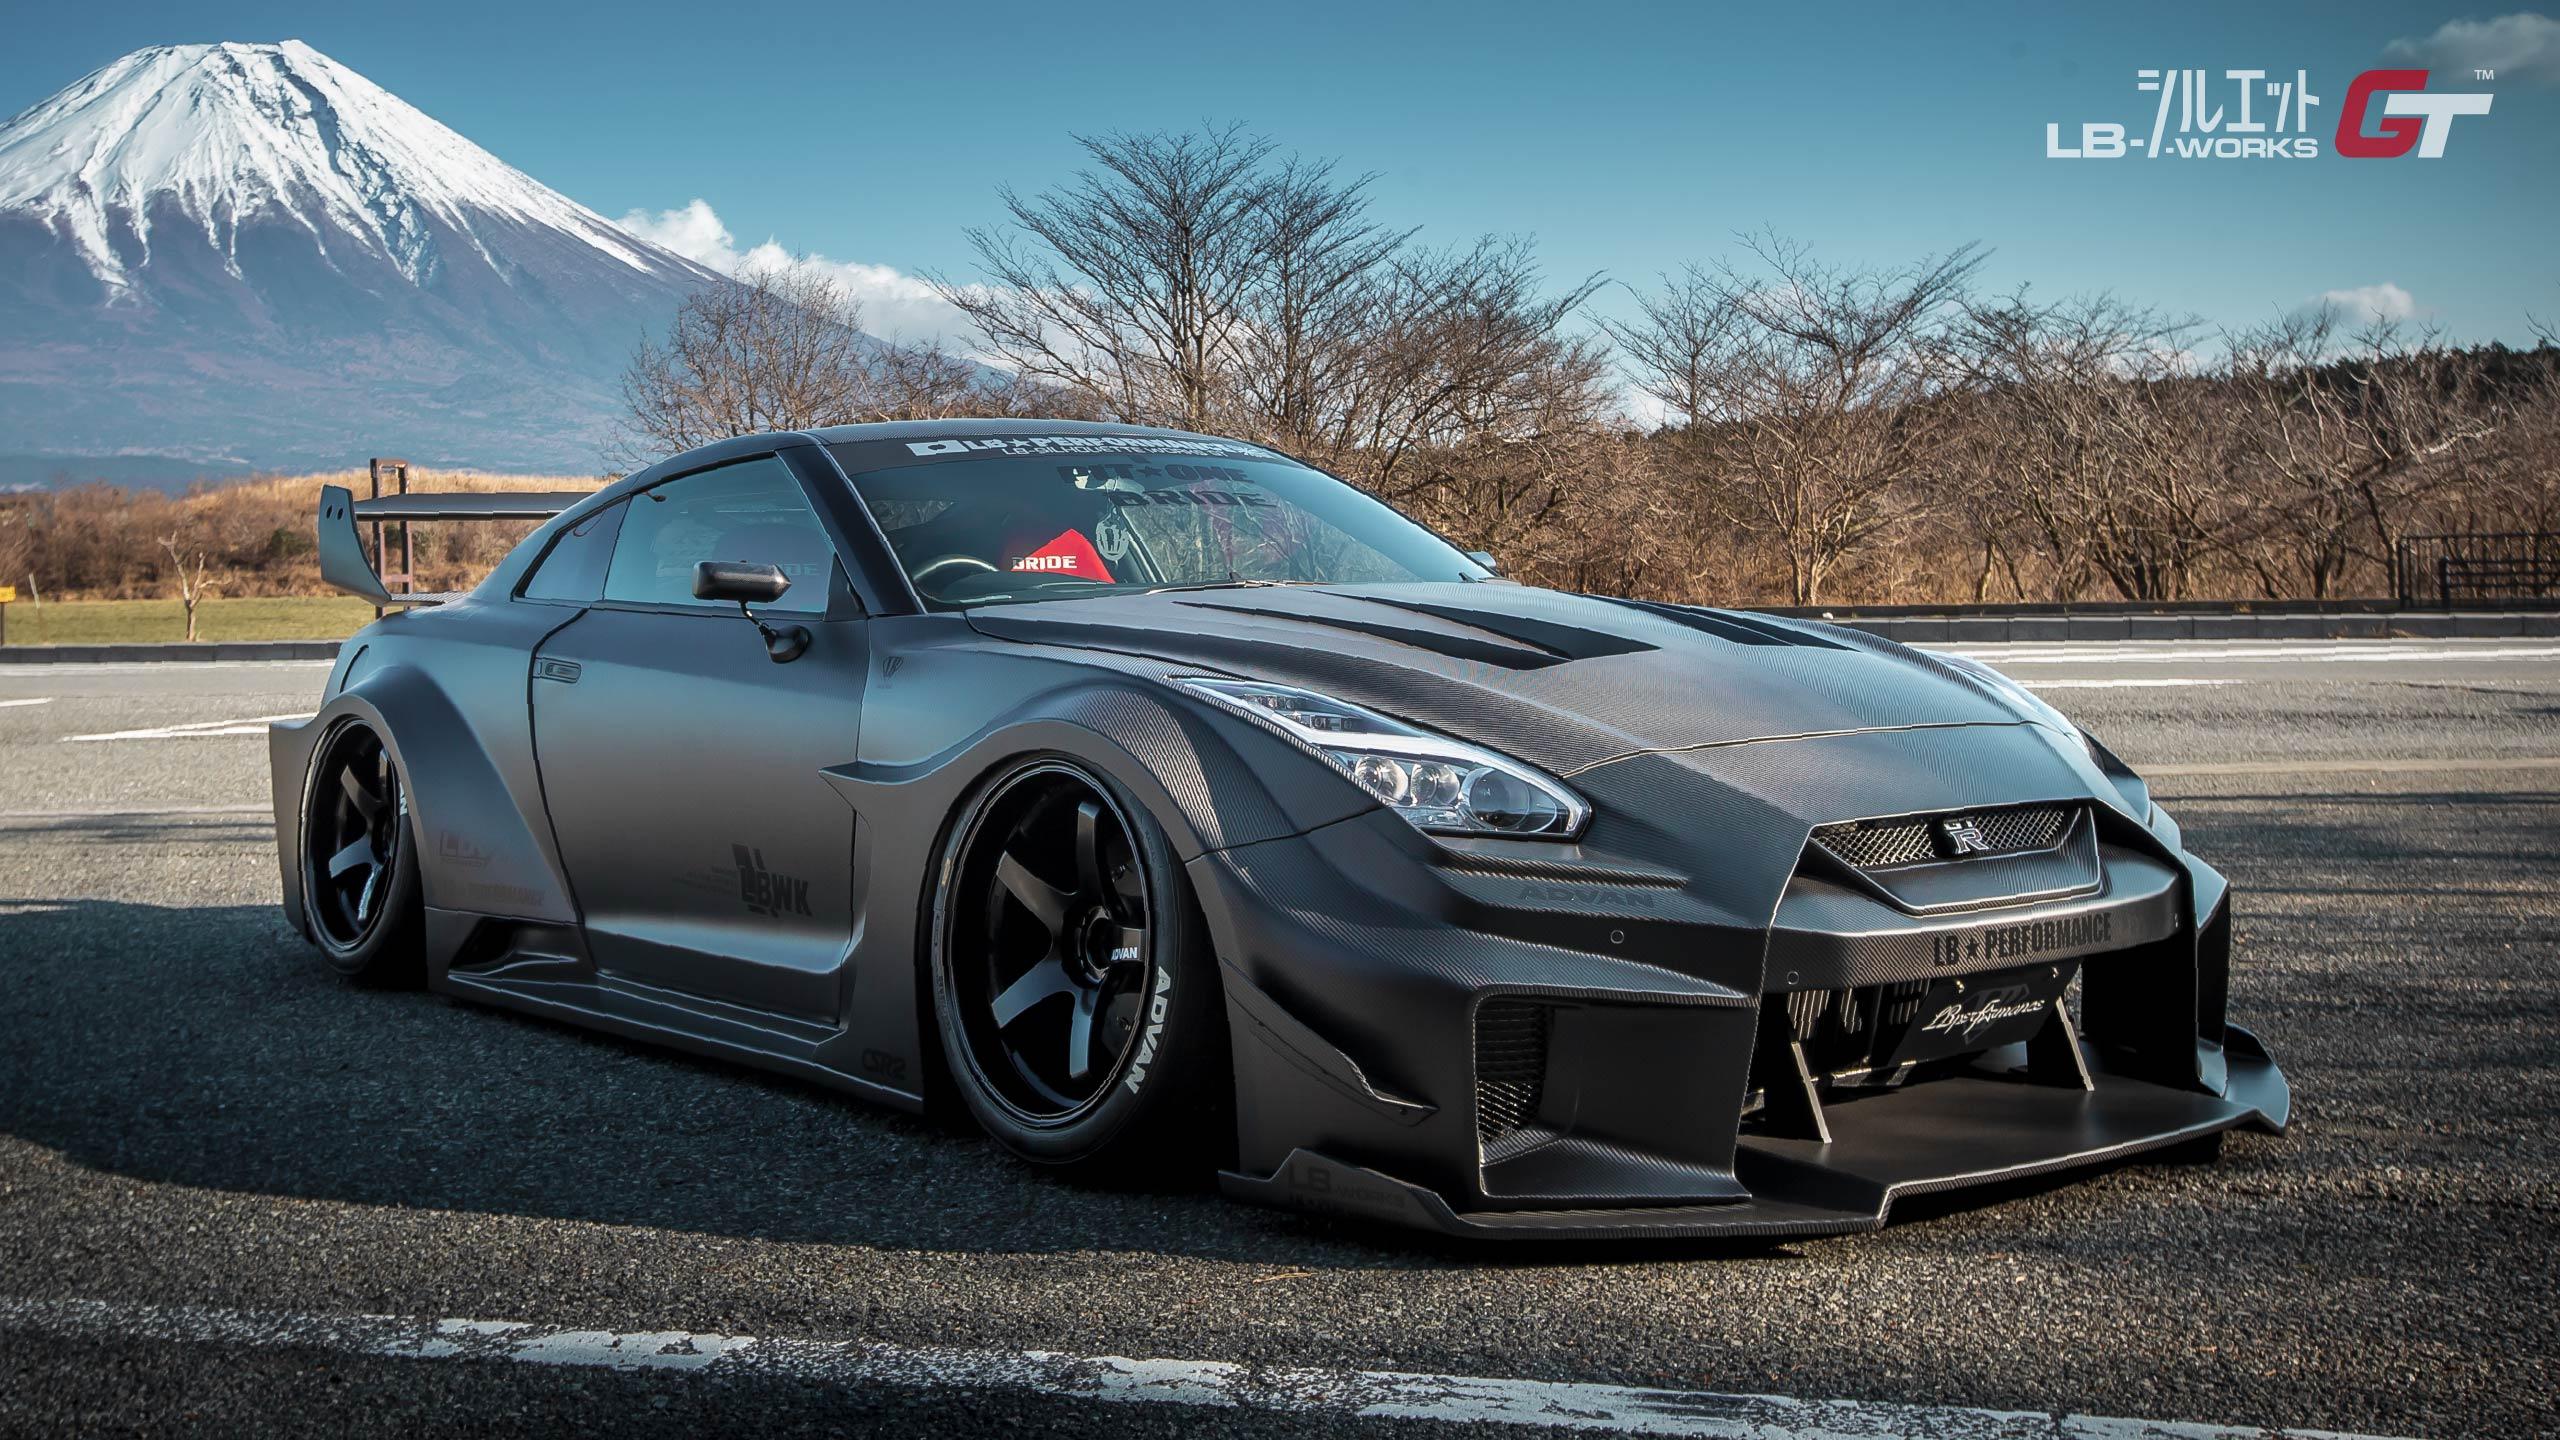 Liberty-Walk-Nissan-GT-R-Super-Silhouette-2